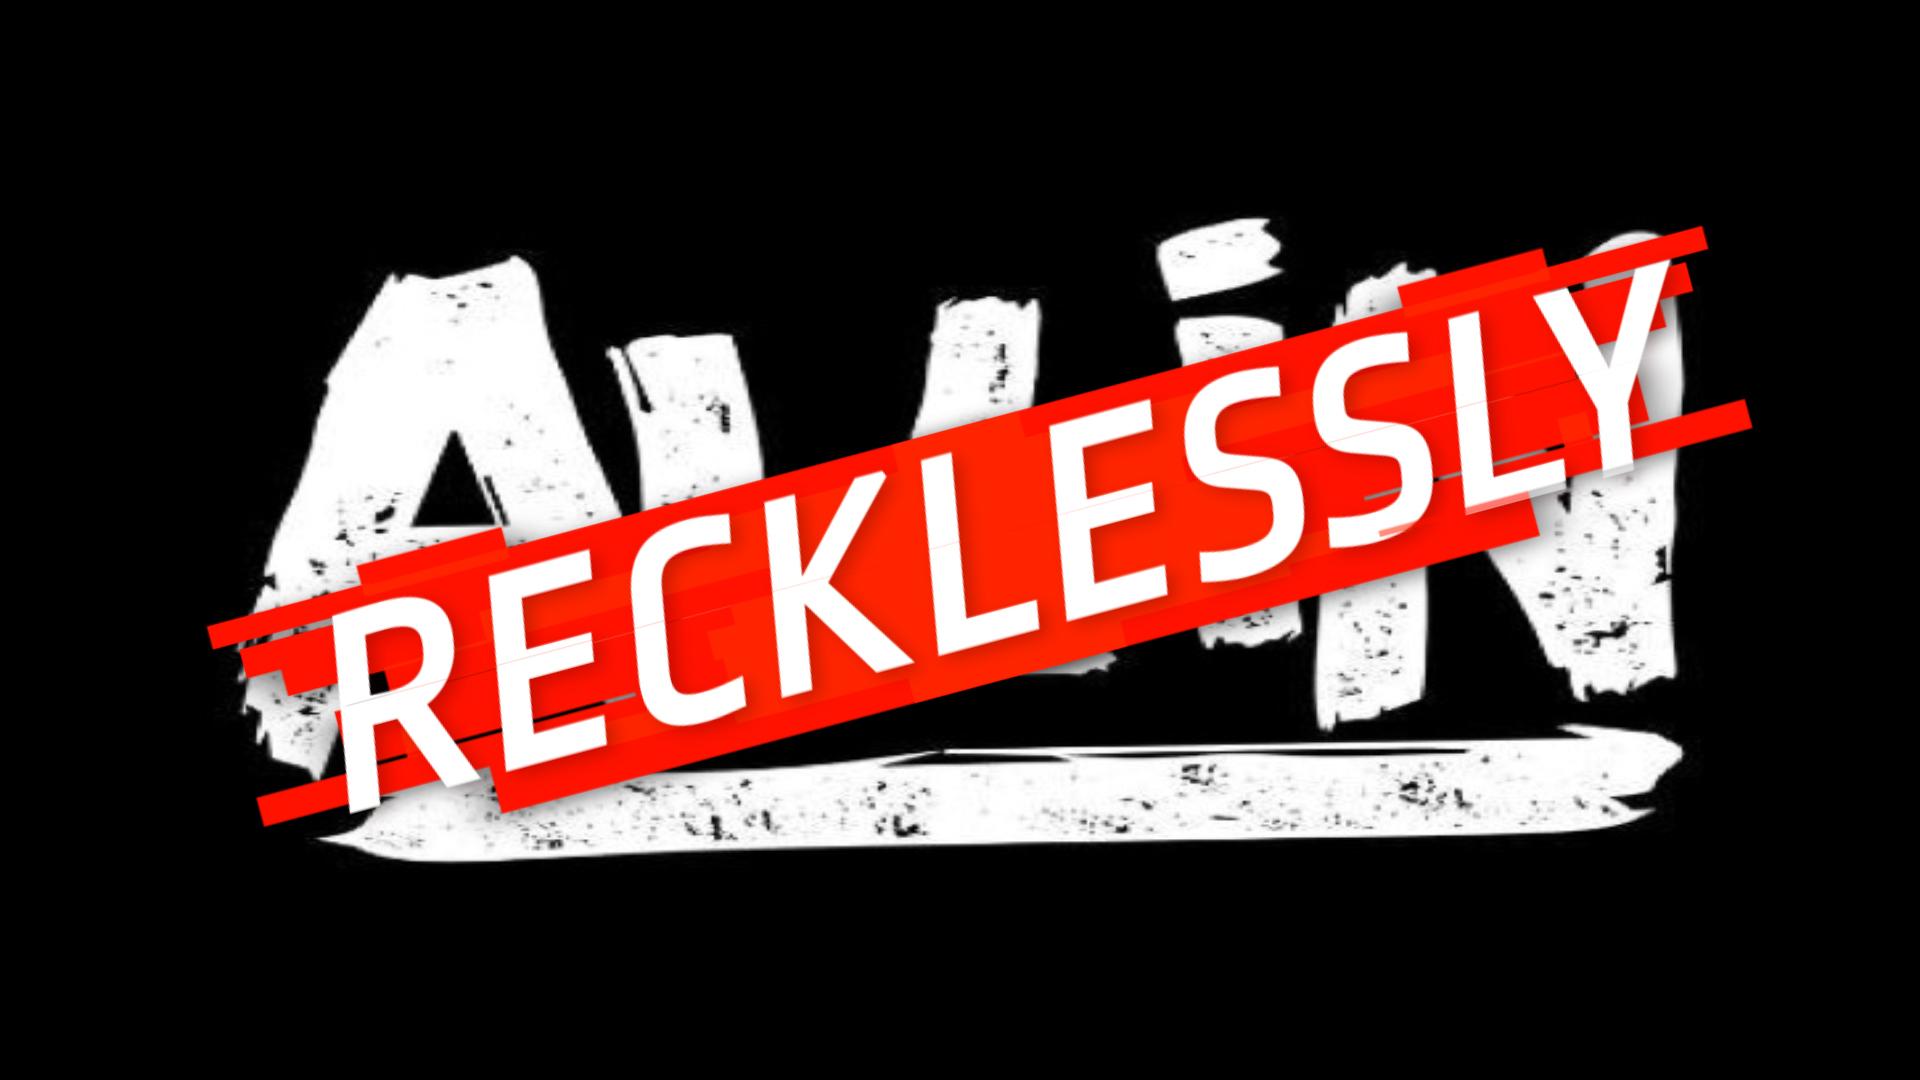 recklessly2 (Converted)0.jpg